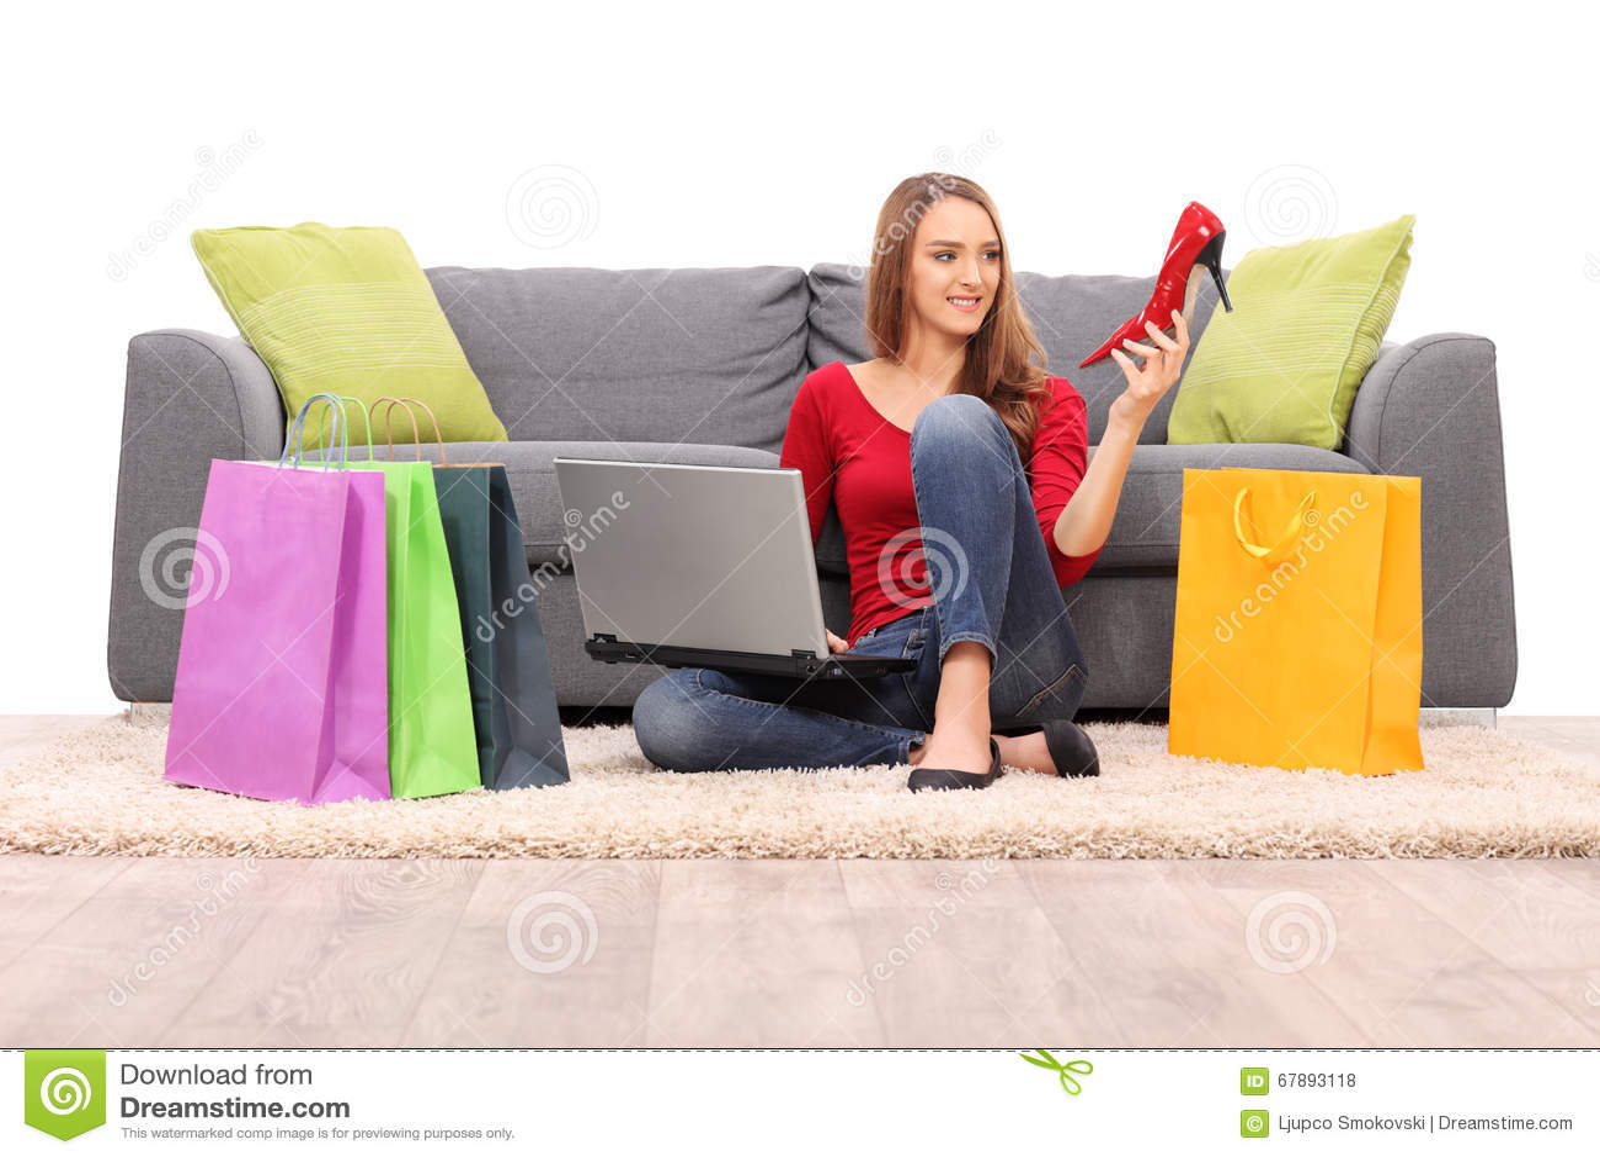 Joyful Woman Buying Shoes Online Stock Photo - Image: 67893118